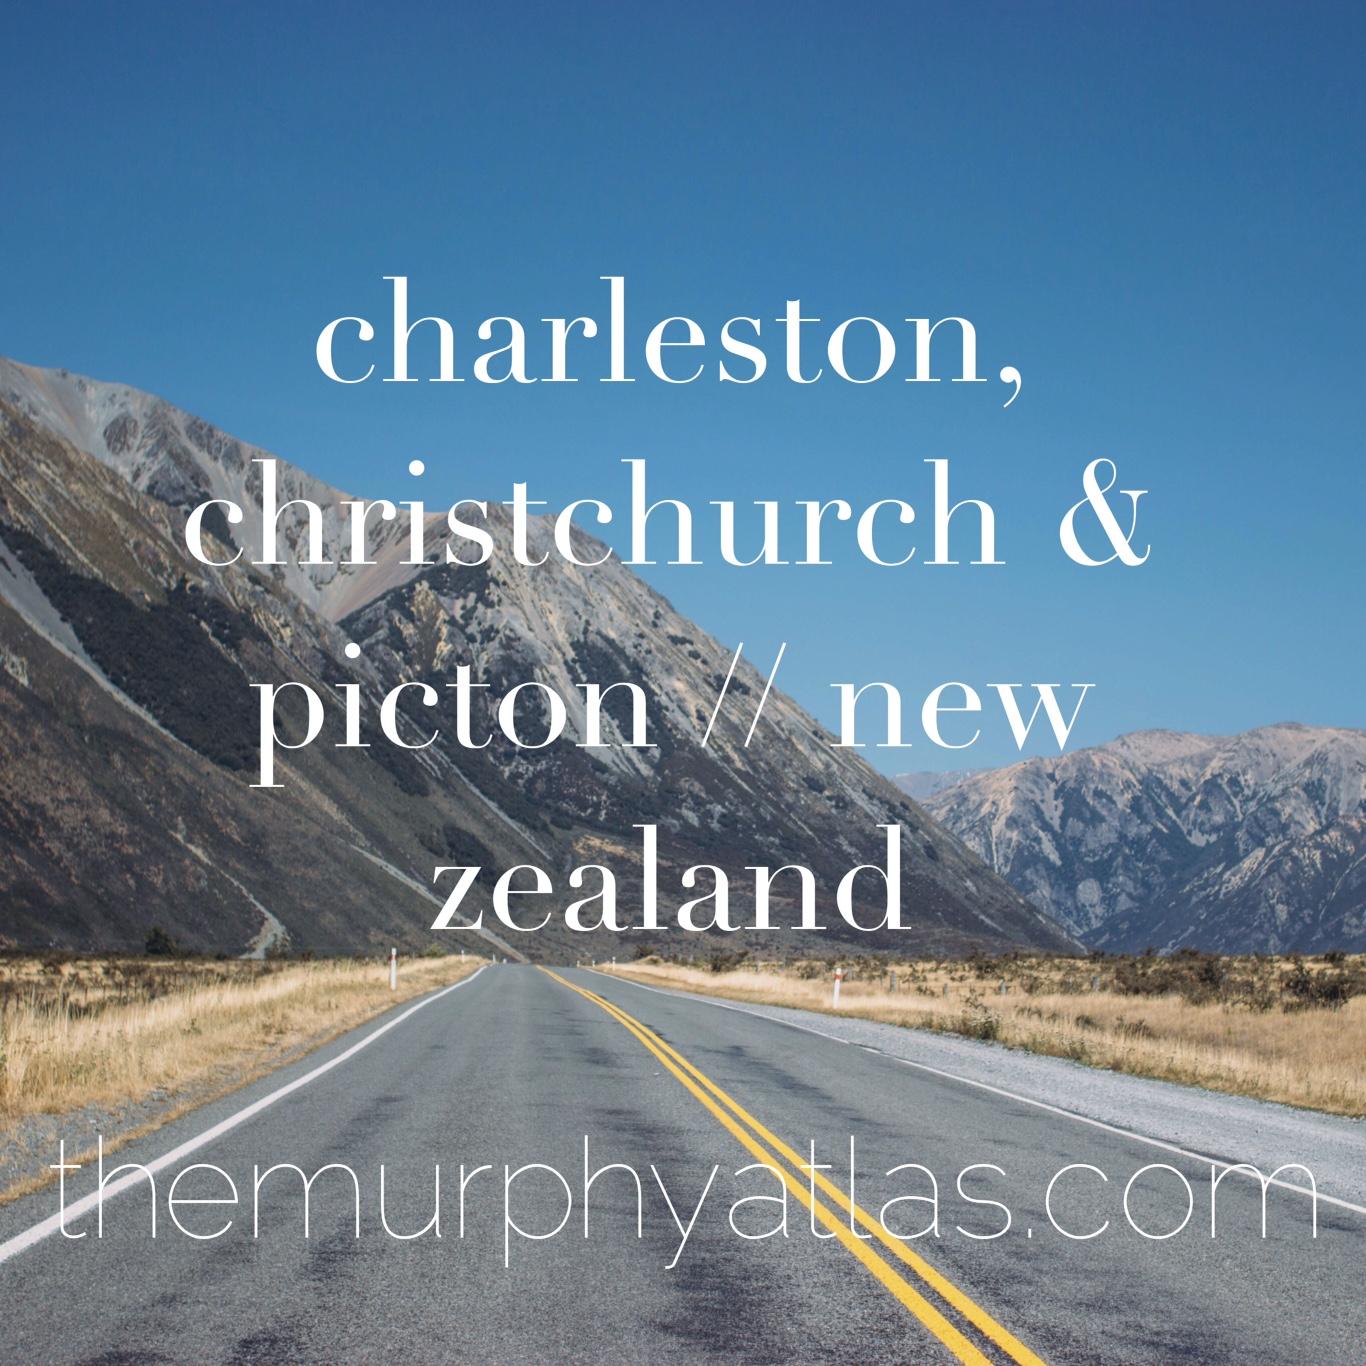 Charleston, Christchurch & Picton // New Zealand Travelogue - The Murphy Atlas